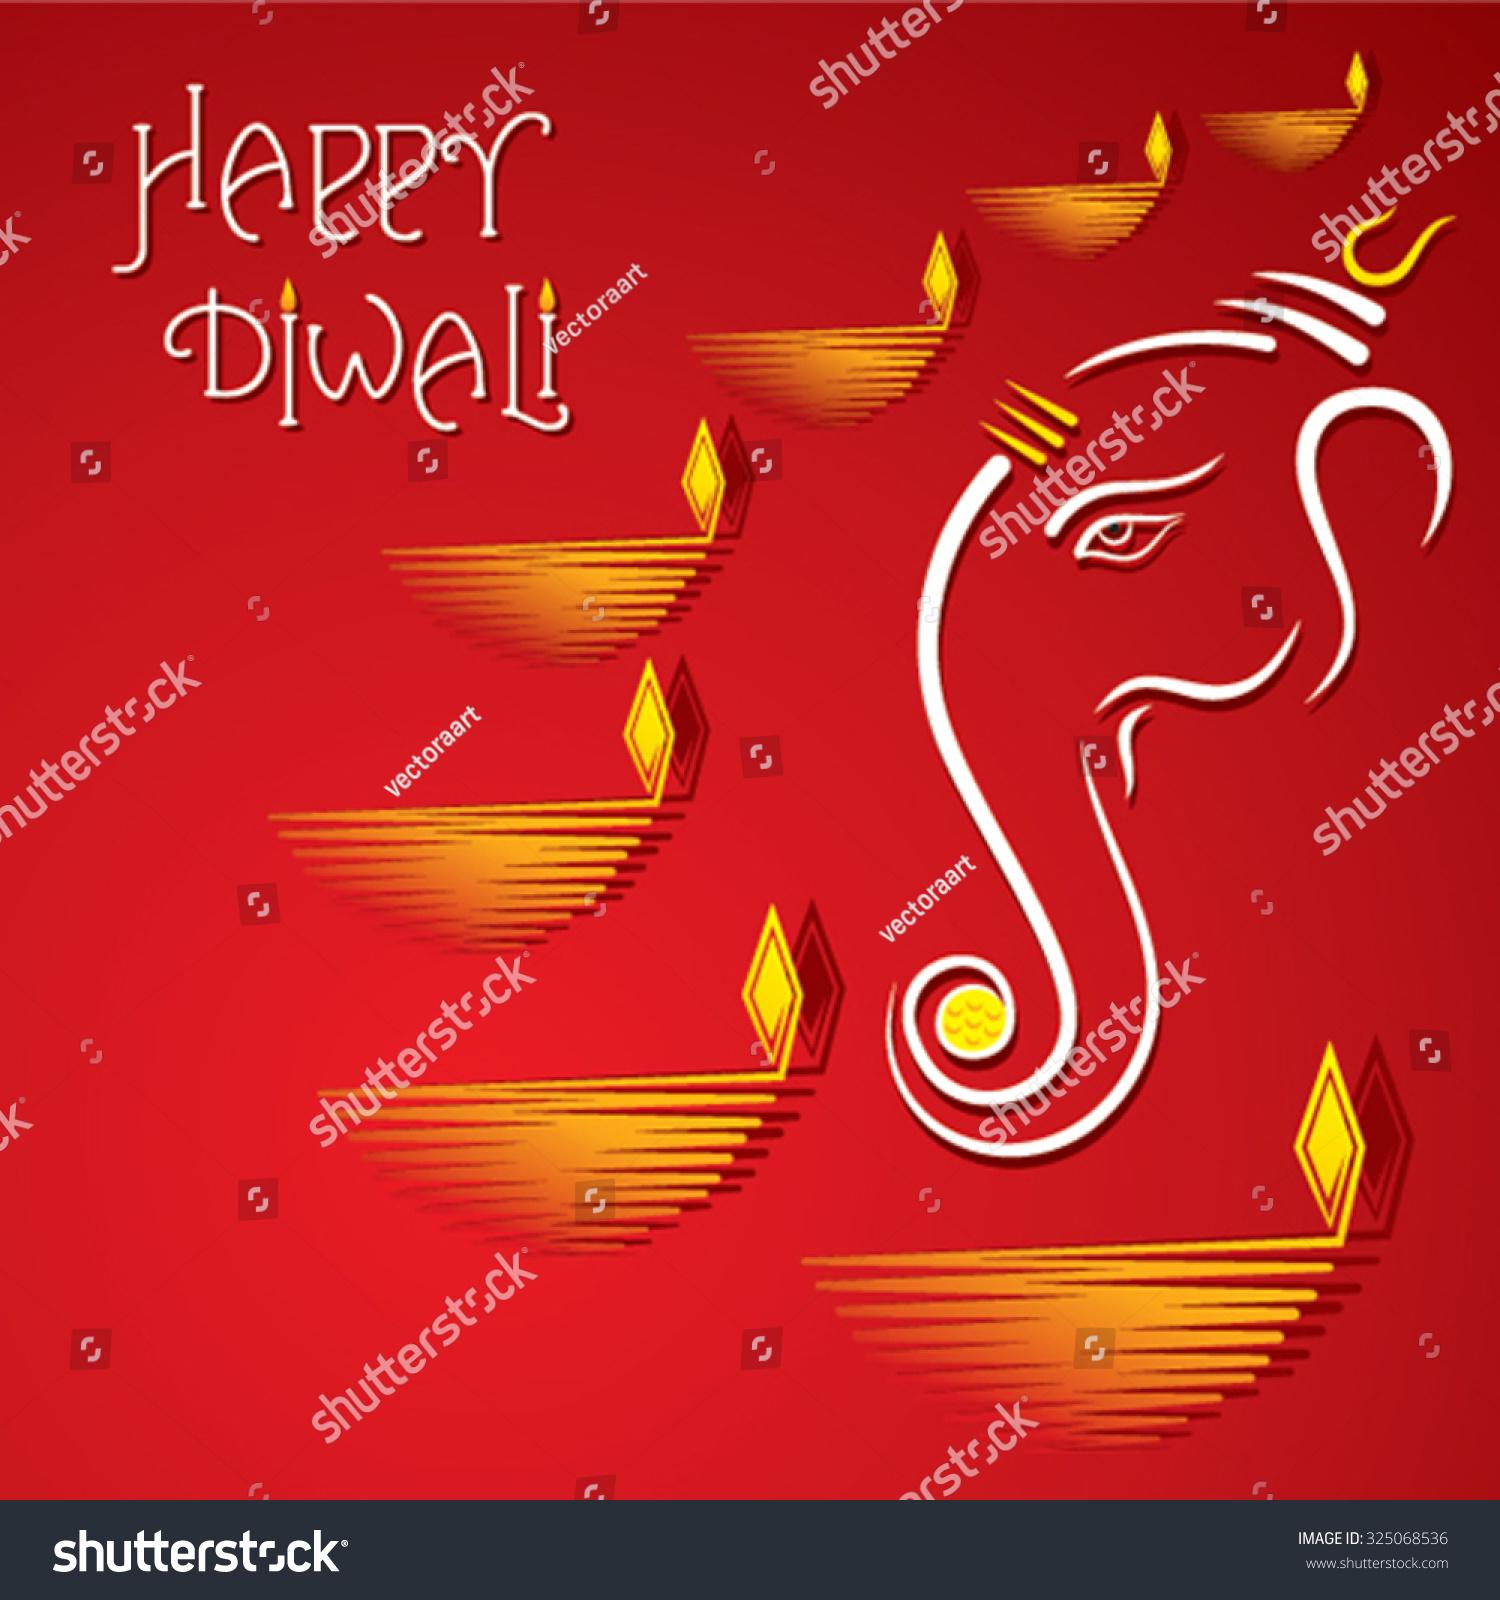 Creative happy diwali greeting design vector ez canvas id 325068536 m4hsunfo